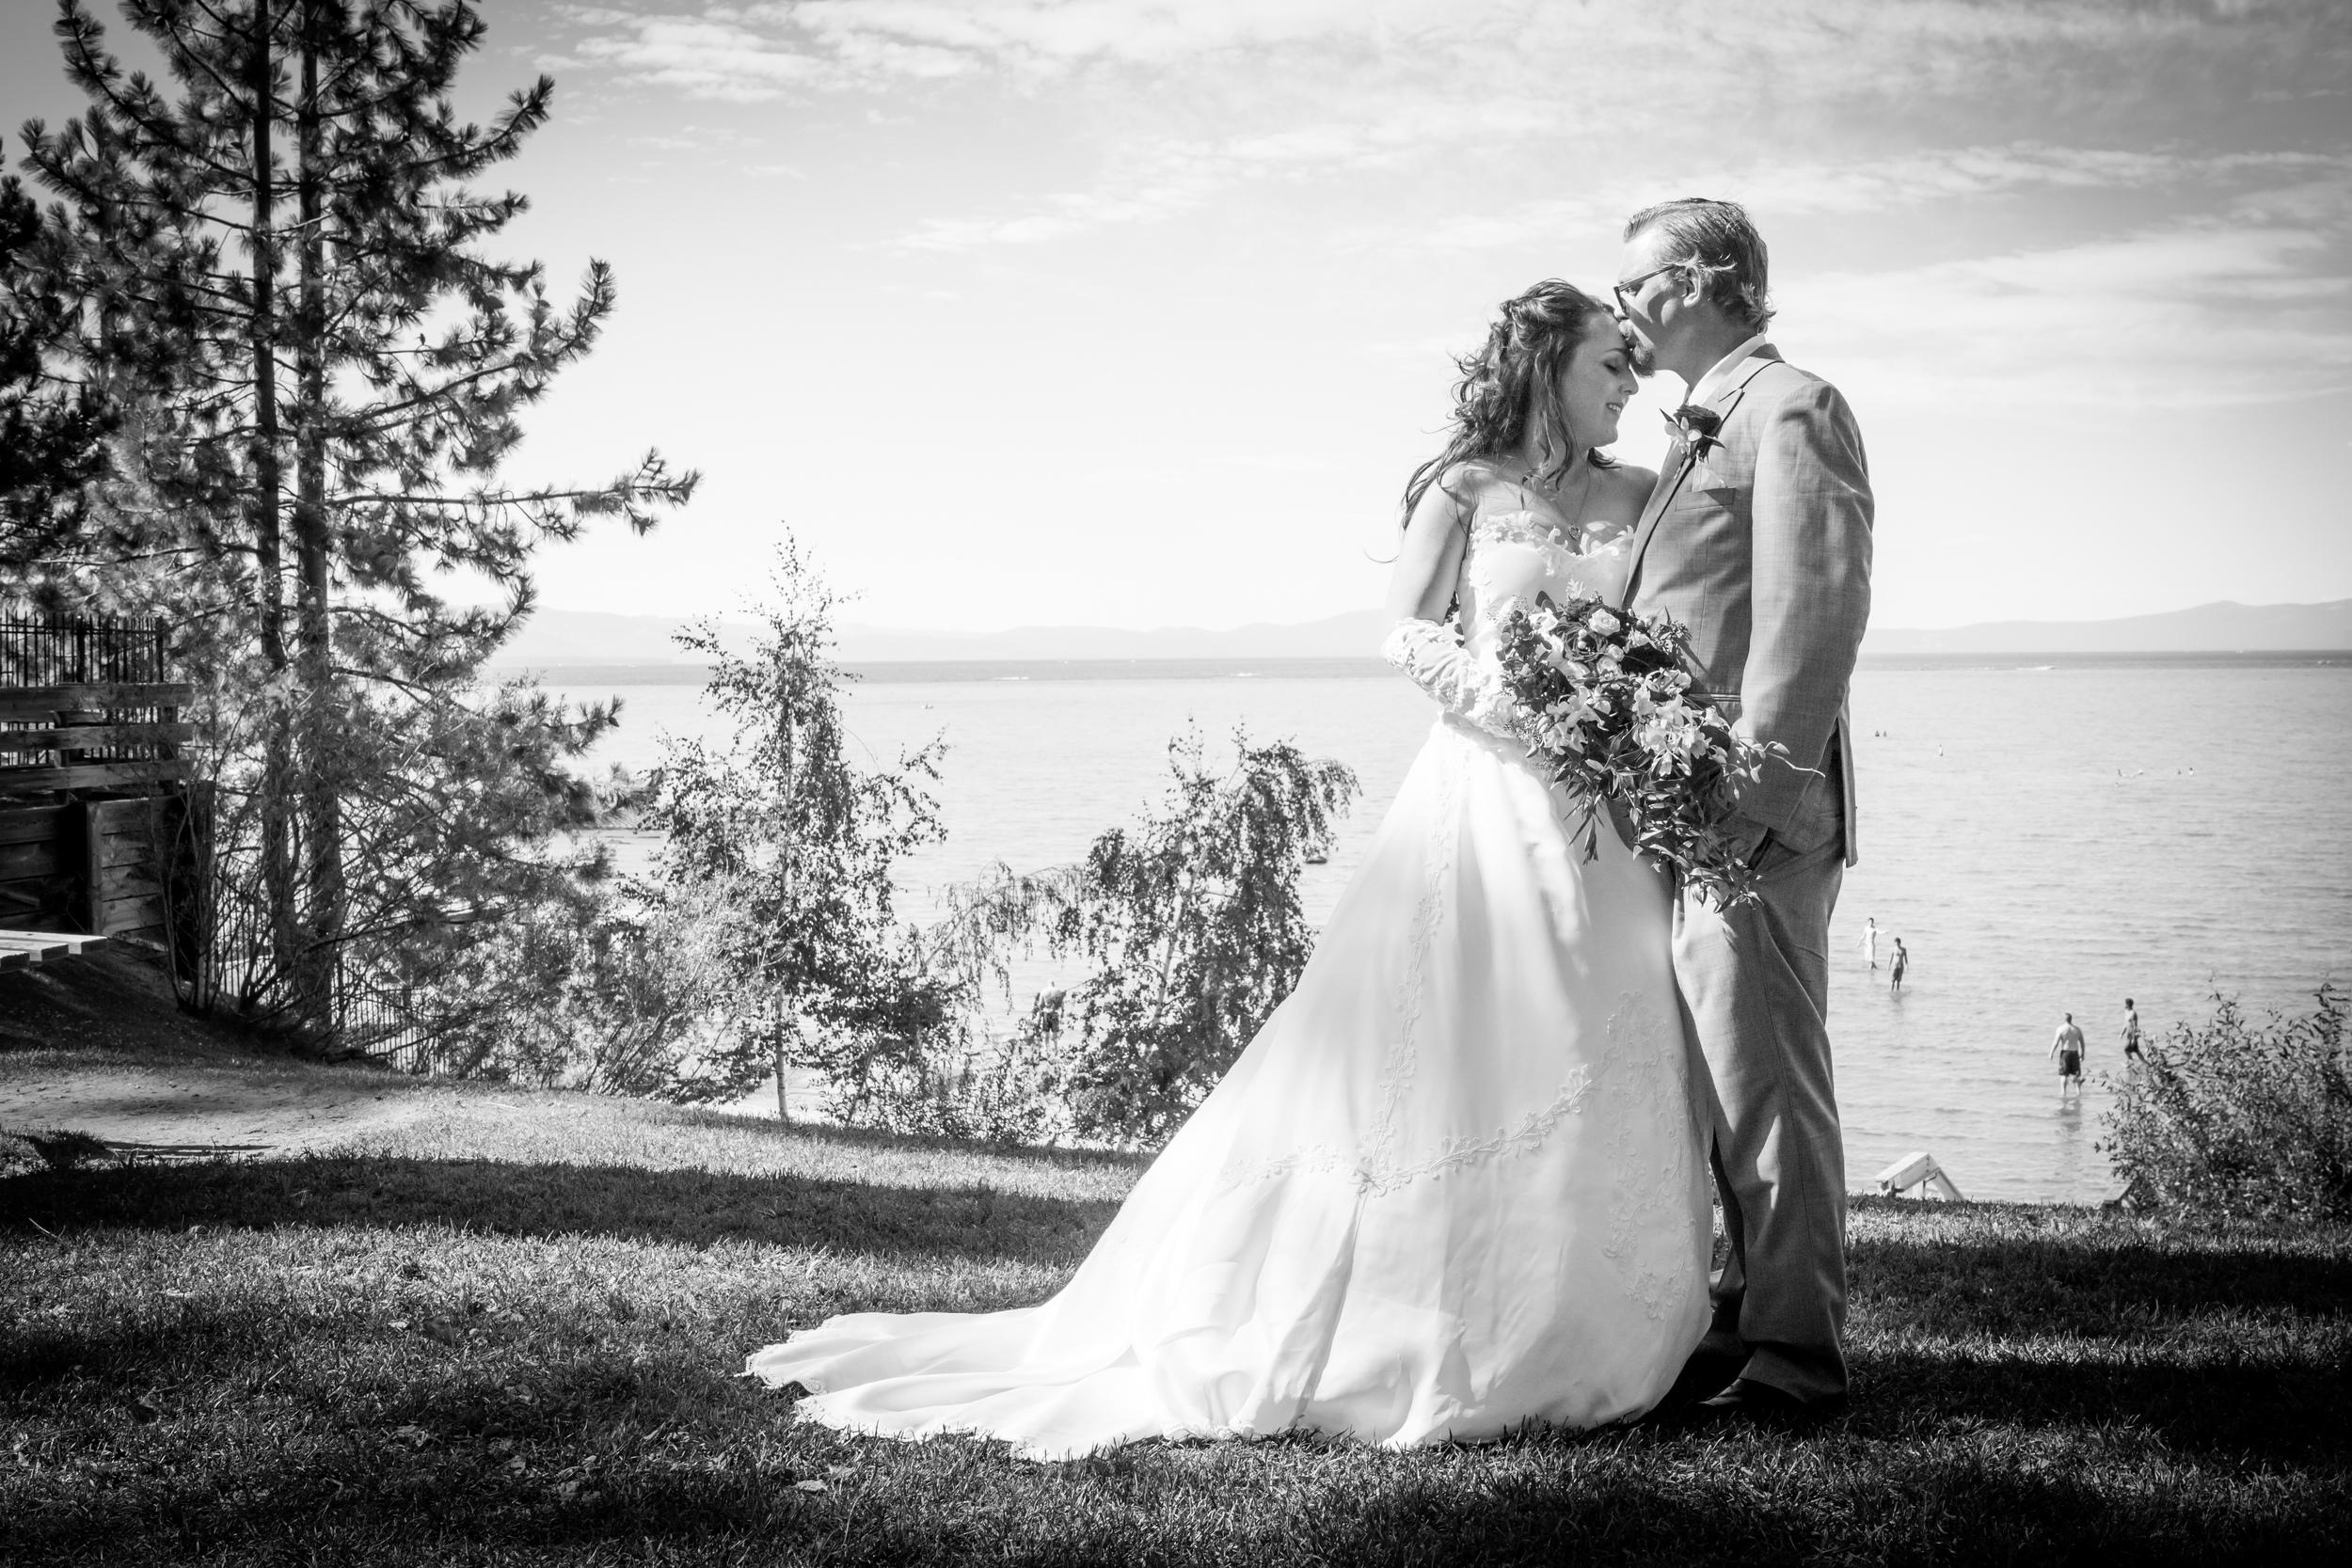 Merhaut_Wedding_2014_242-2.jpg